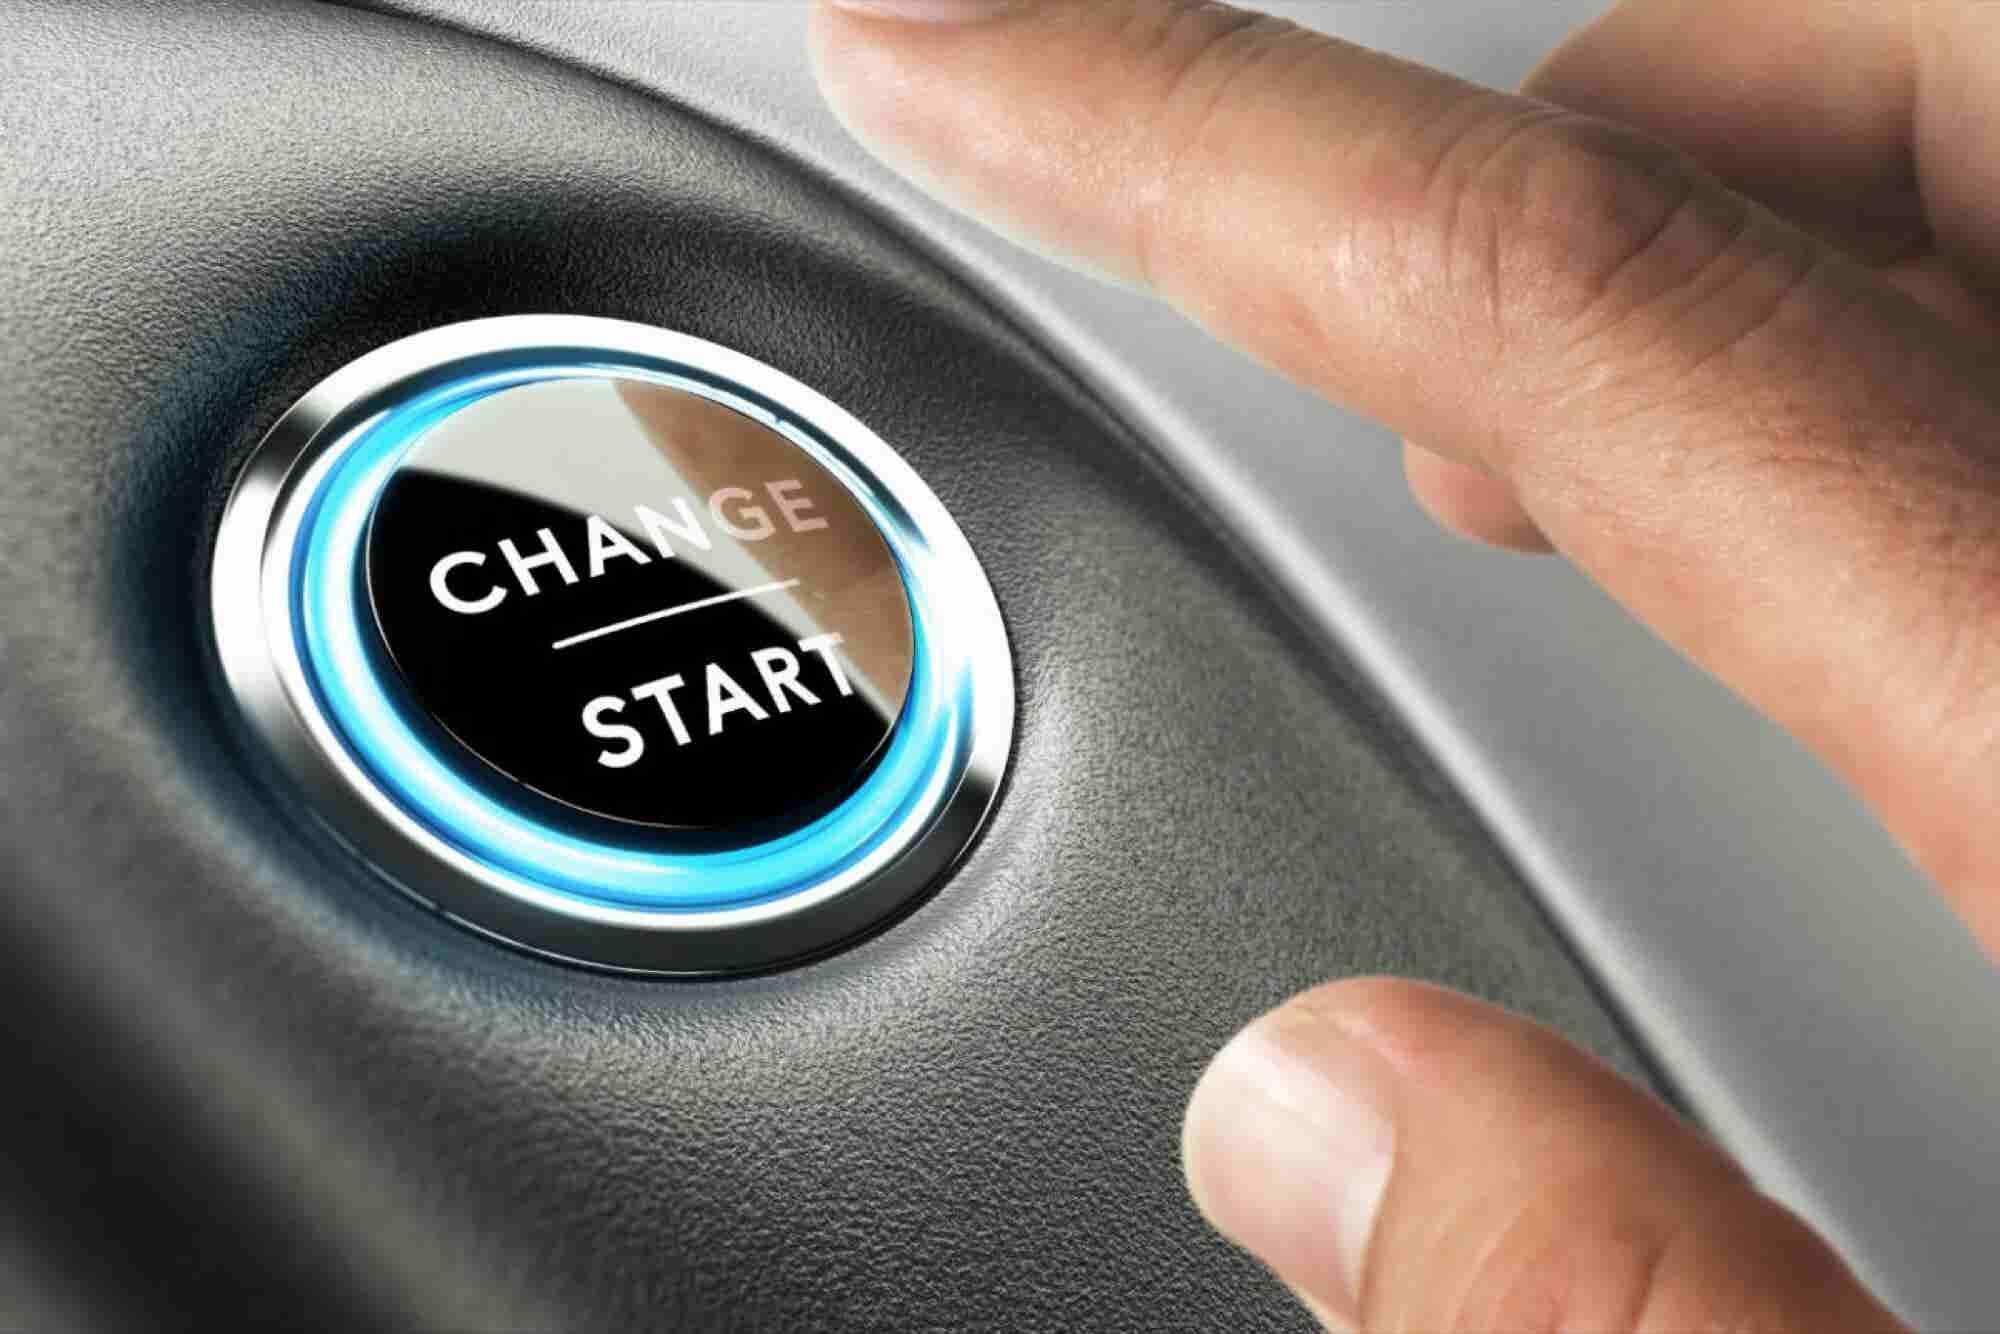 5 pasos para reinventar tu negocio